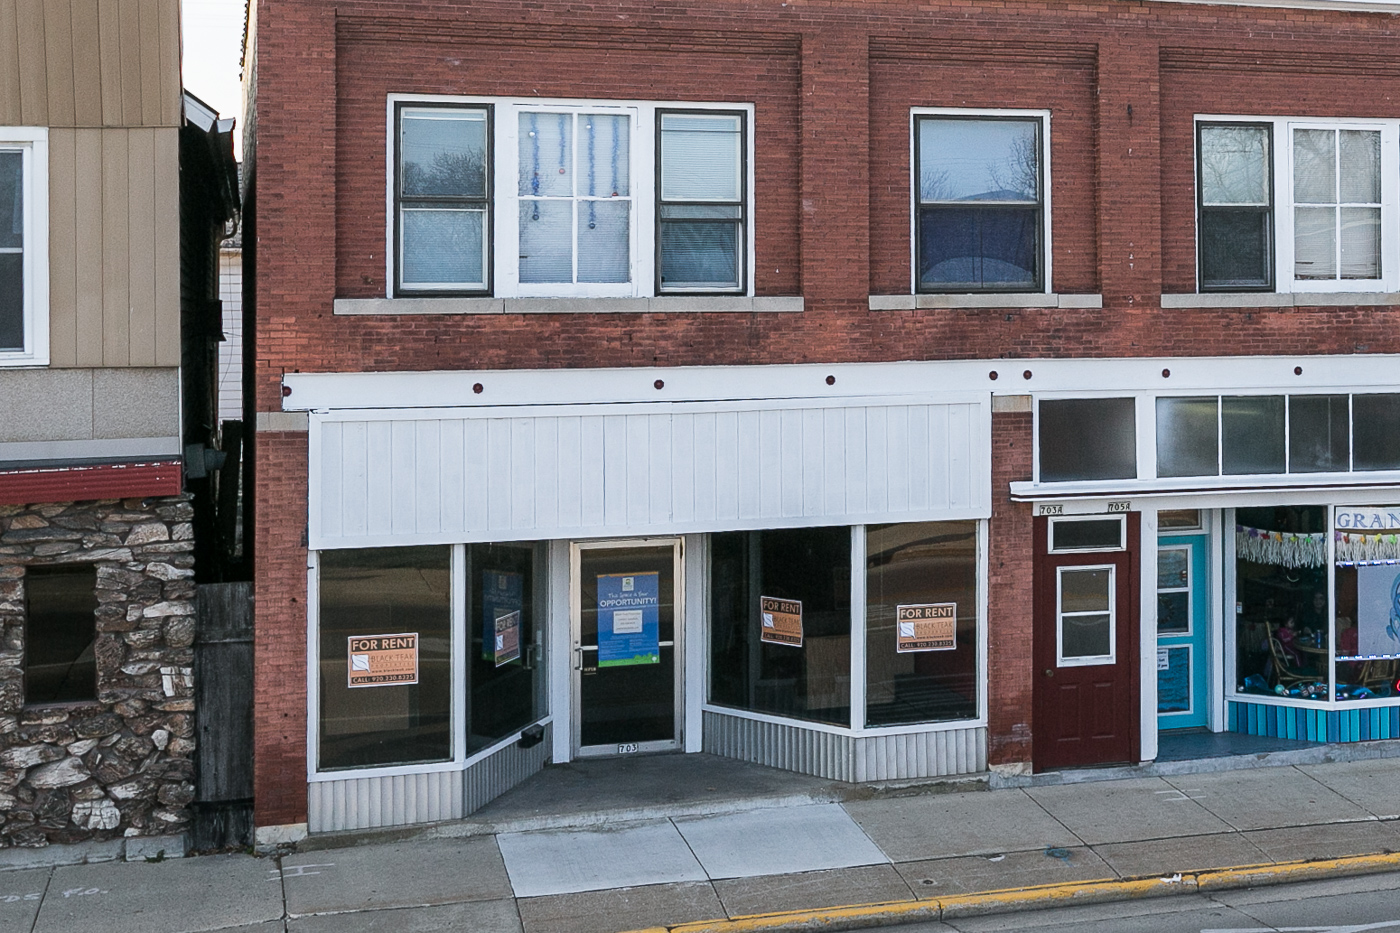 705 A North Main Street